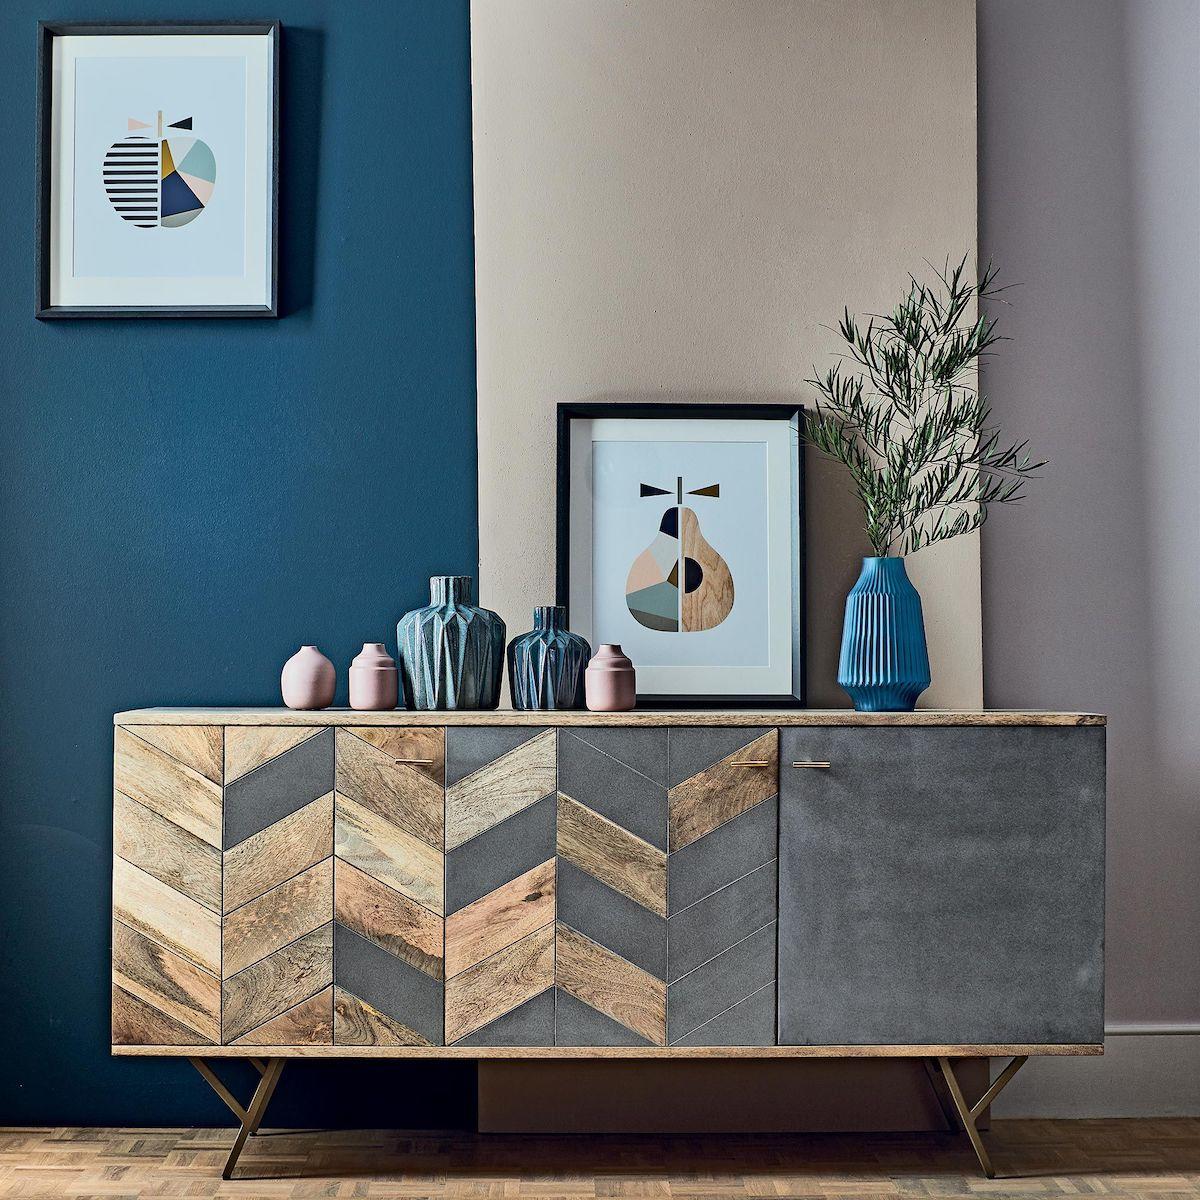 meuble style scandinave bois gris béton mur bleu canard blog déco